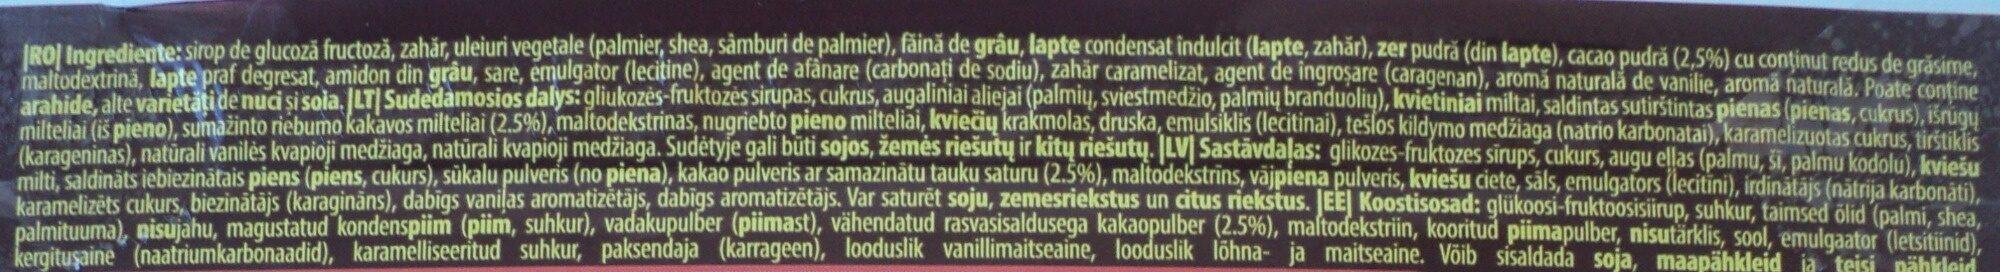 Lion - Ingredients - lt